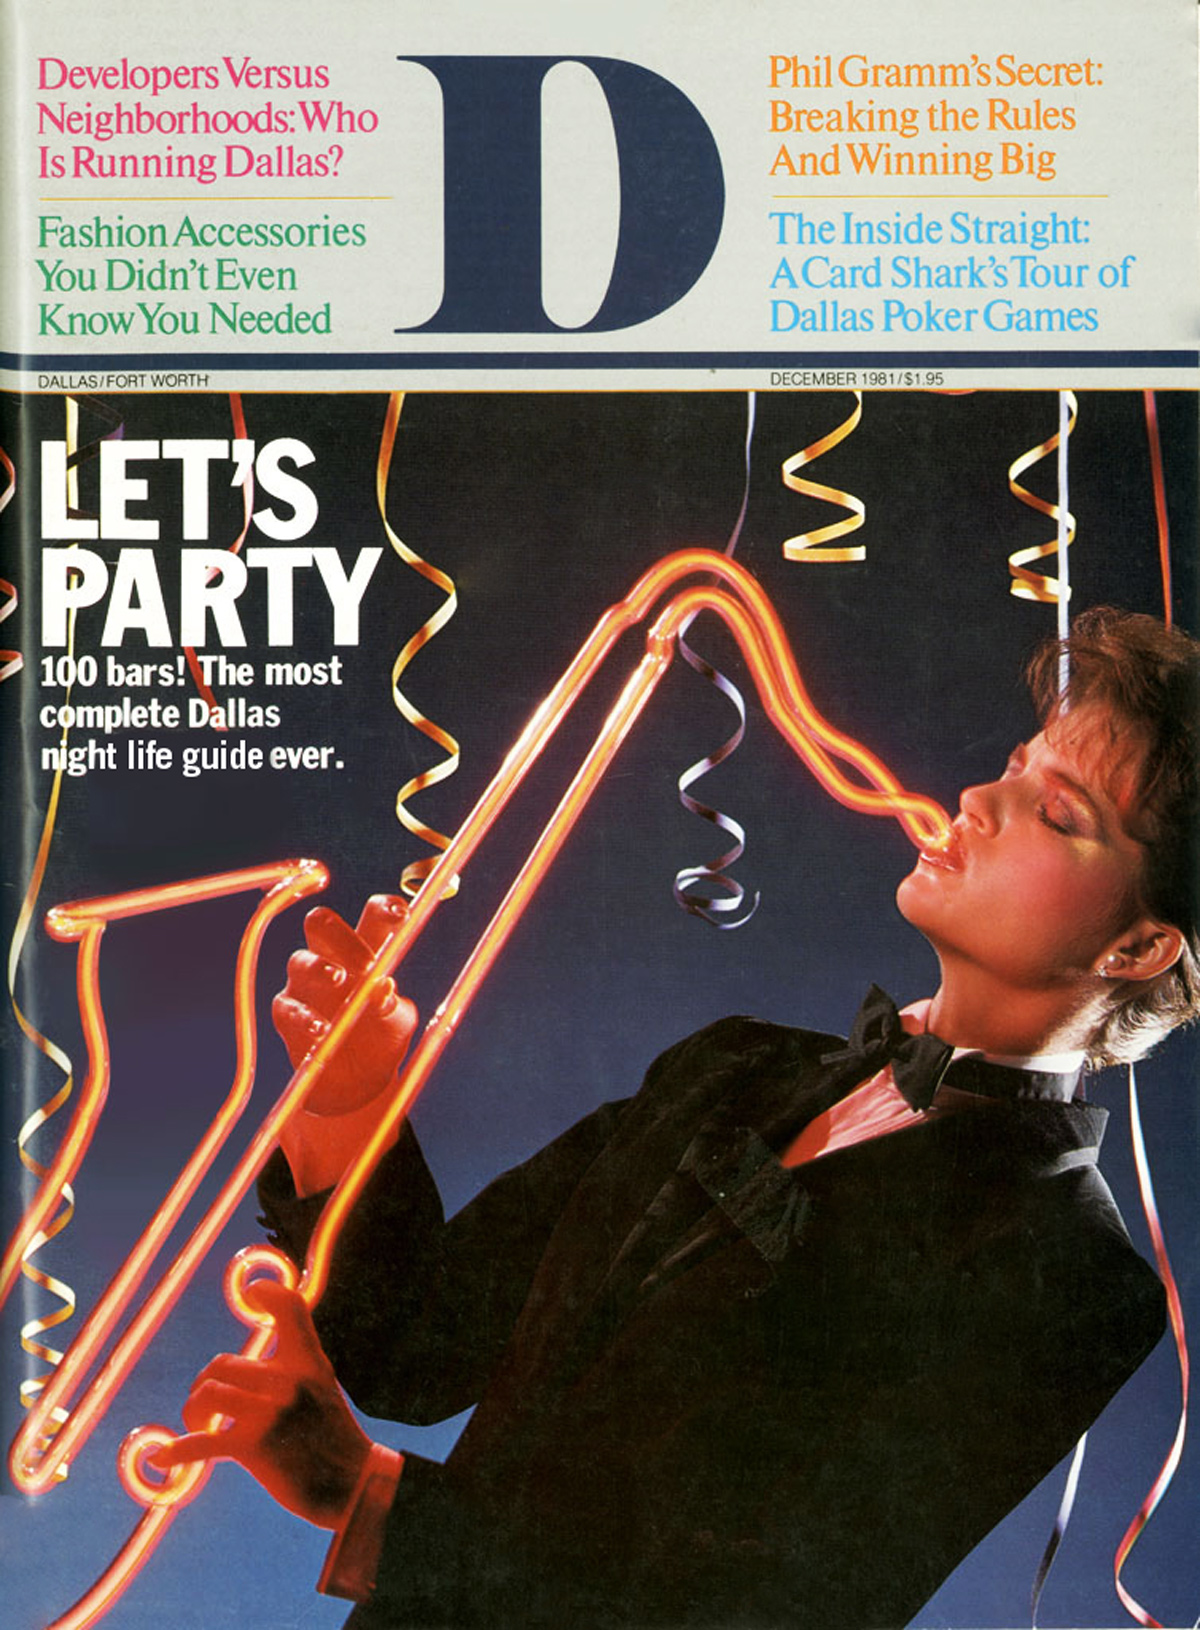 December 1981 cover